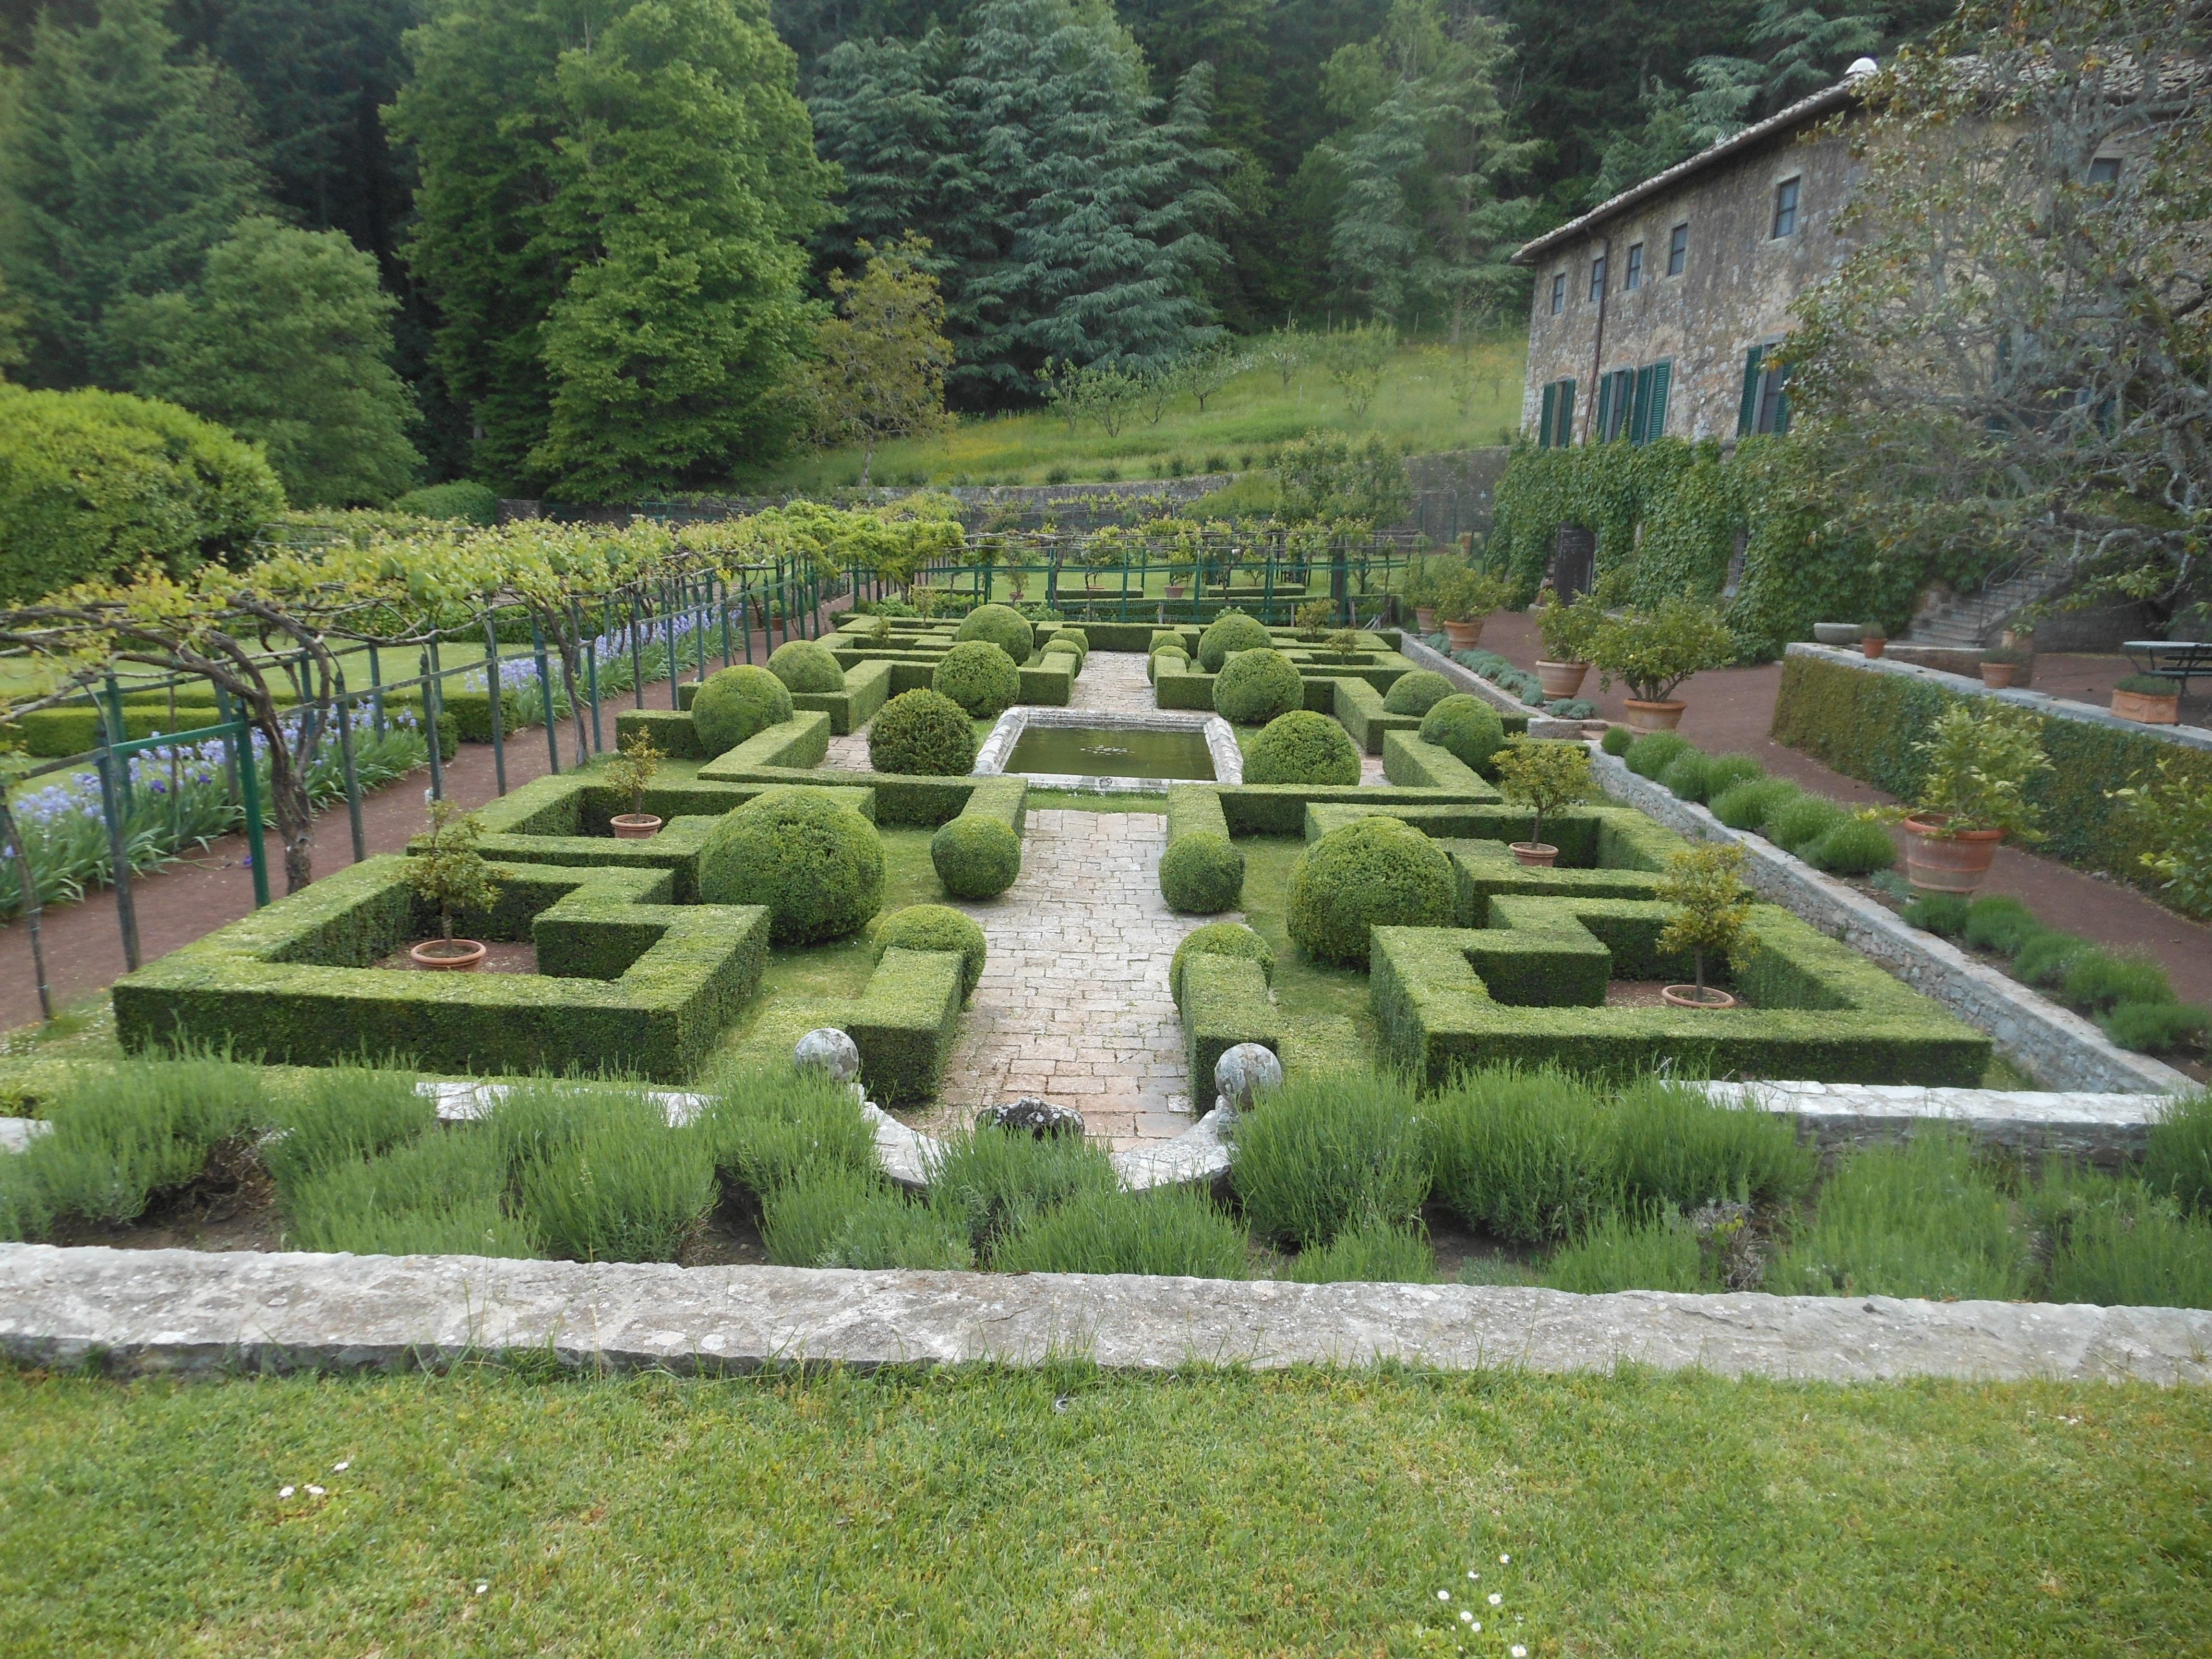 Fotos Gratis C Sped Italia Bot Nica Arbusto Jardines Jard N Bot Nico Inmuebles Siena